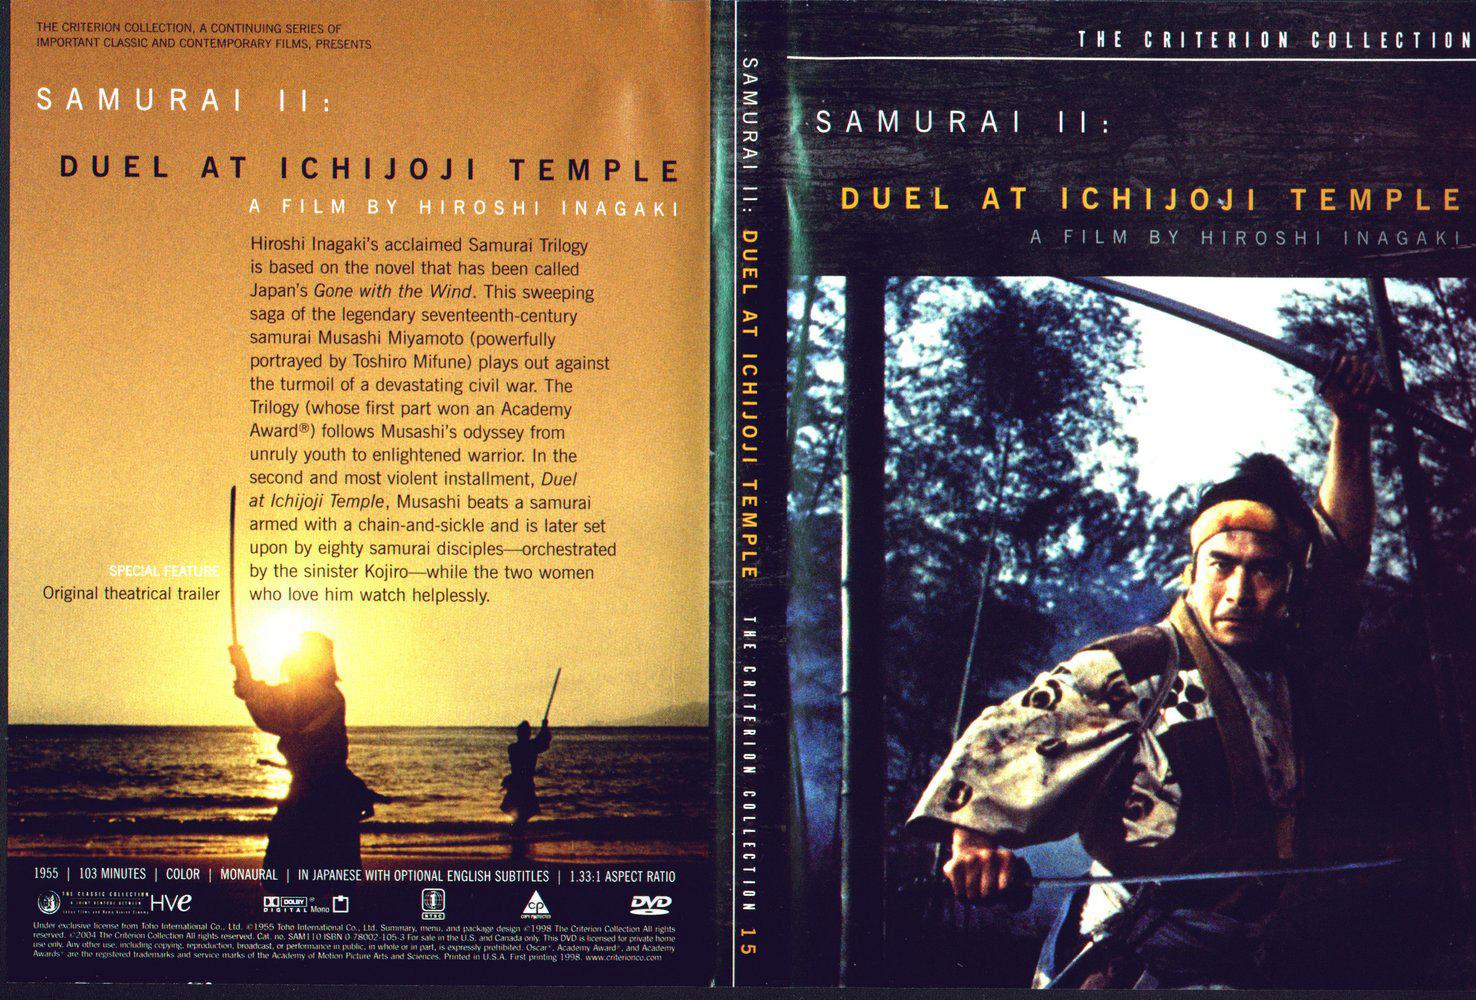 samurai.ii.duel.at.ichijoji.temple.1955 english subtitles